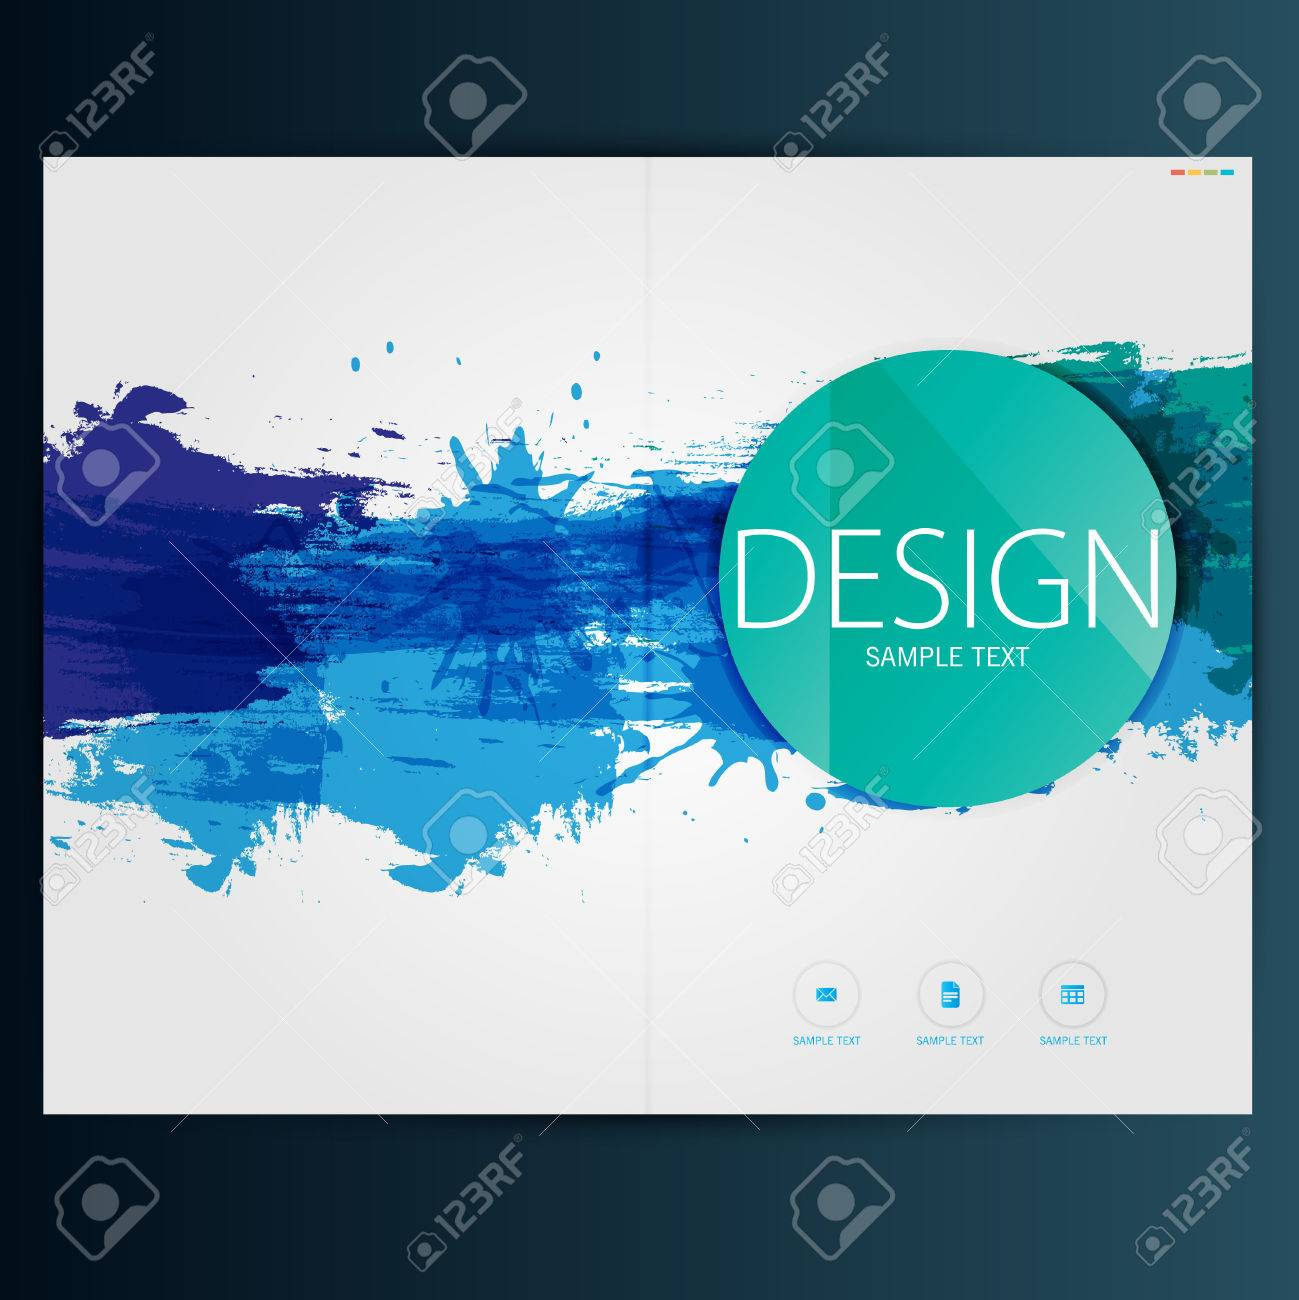 Modern Vector abstract brochure, report or flyer design template - 38308101